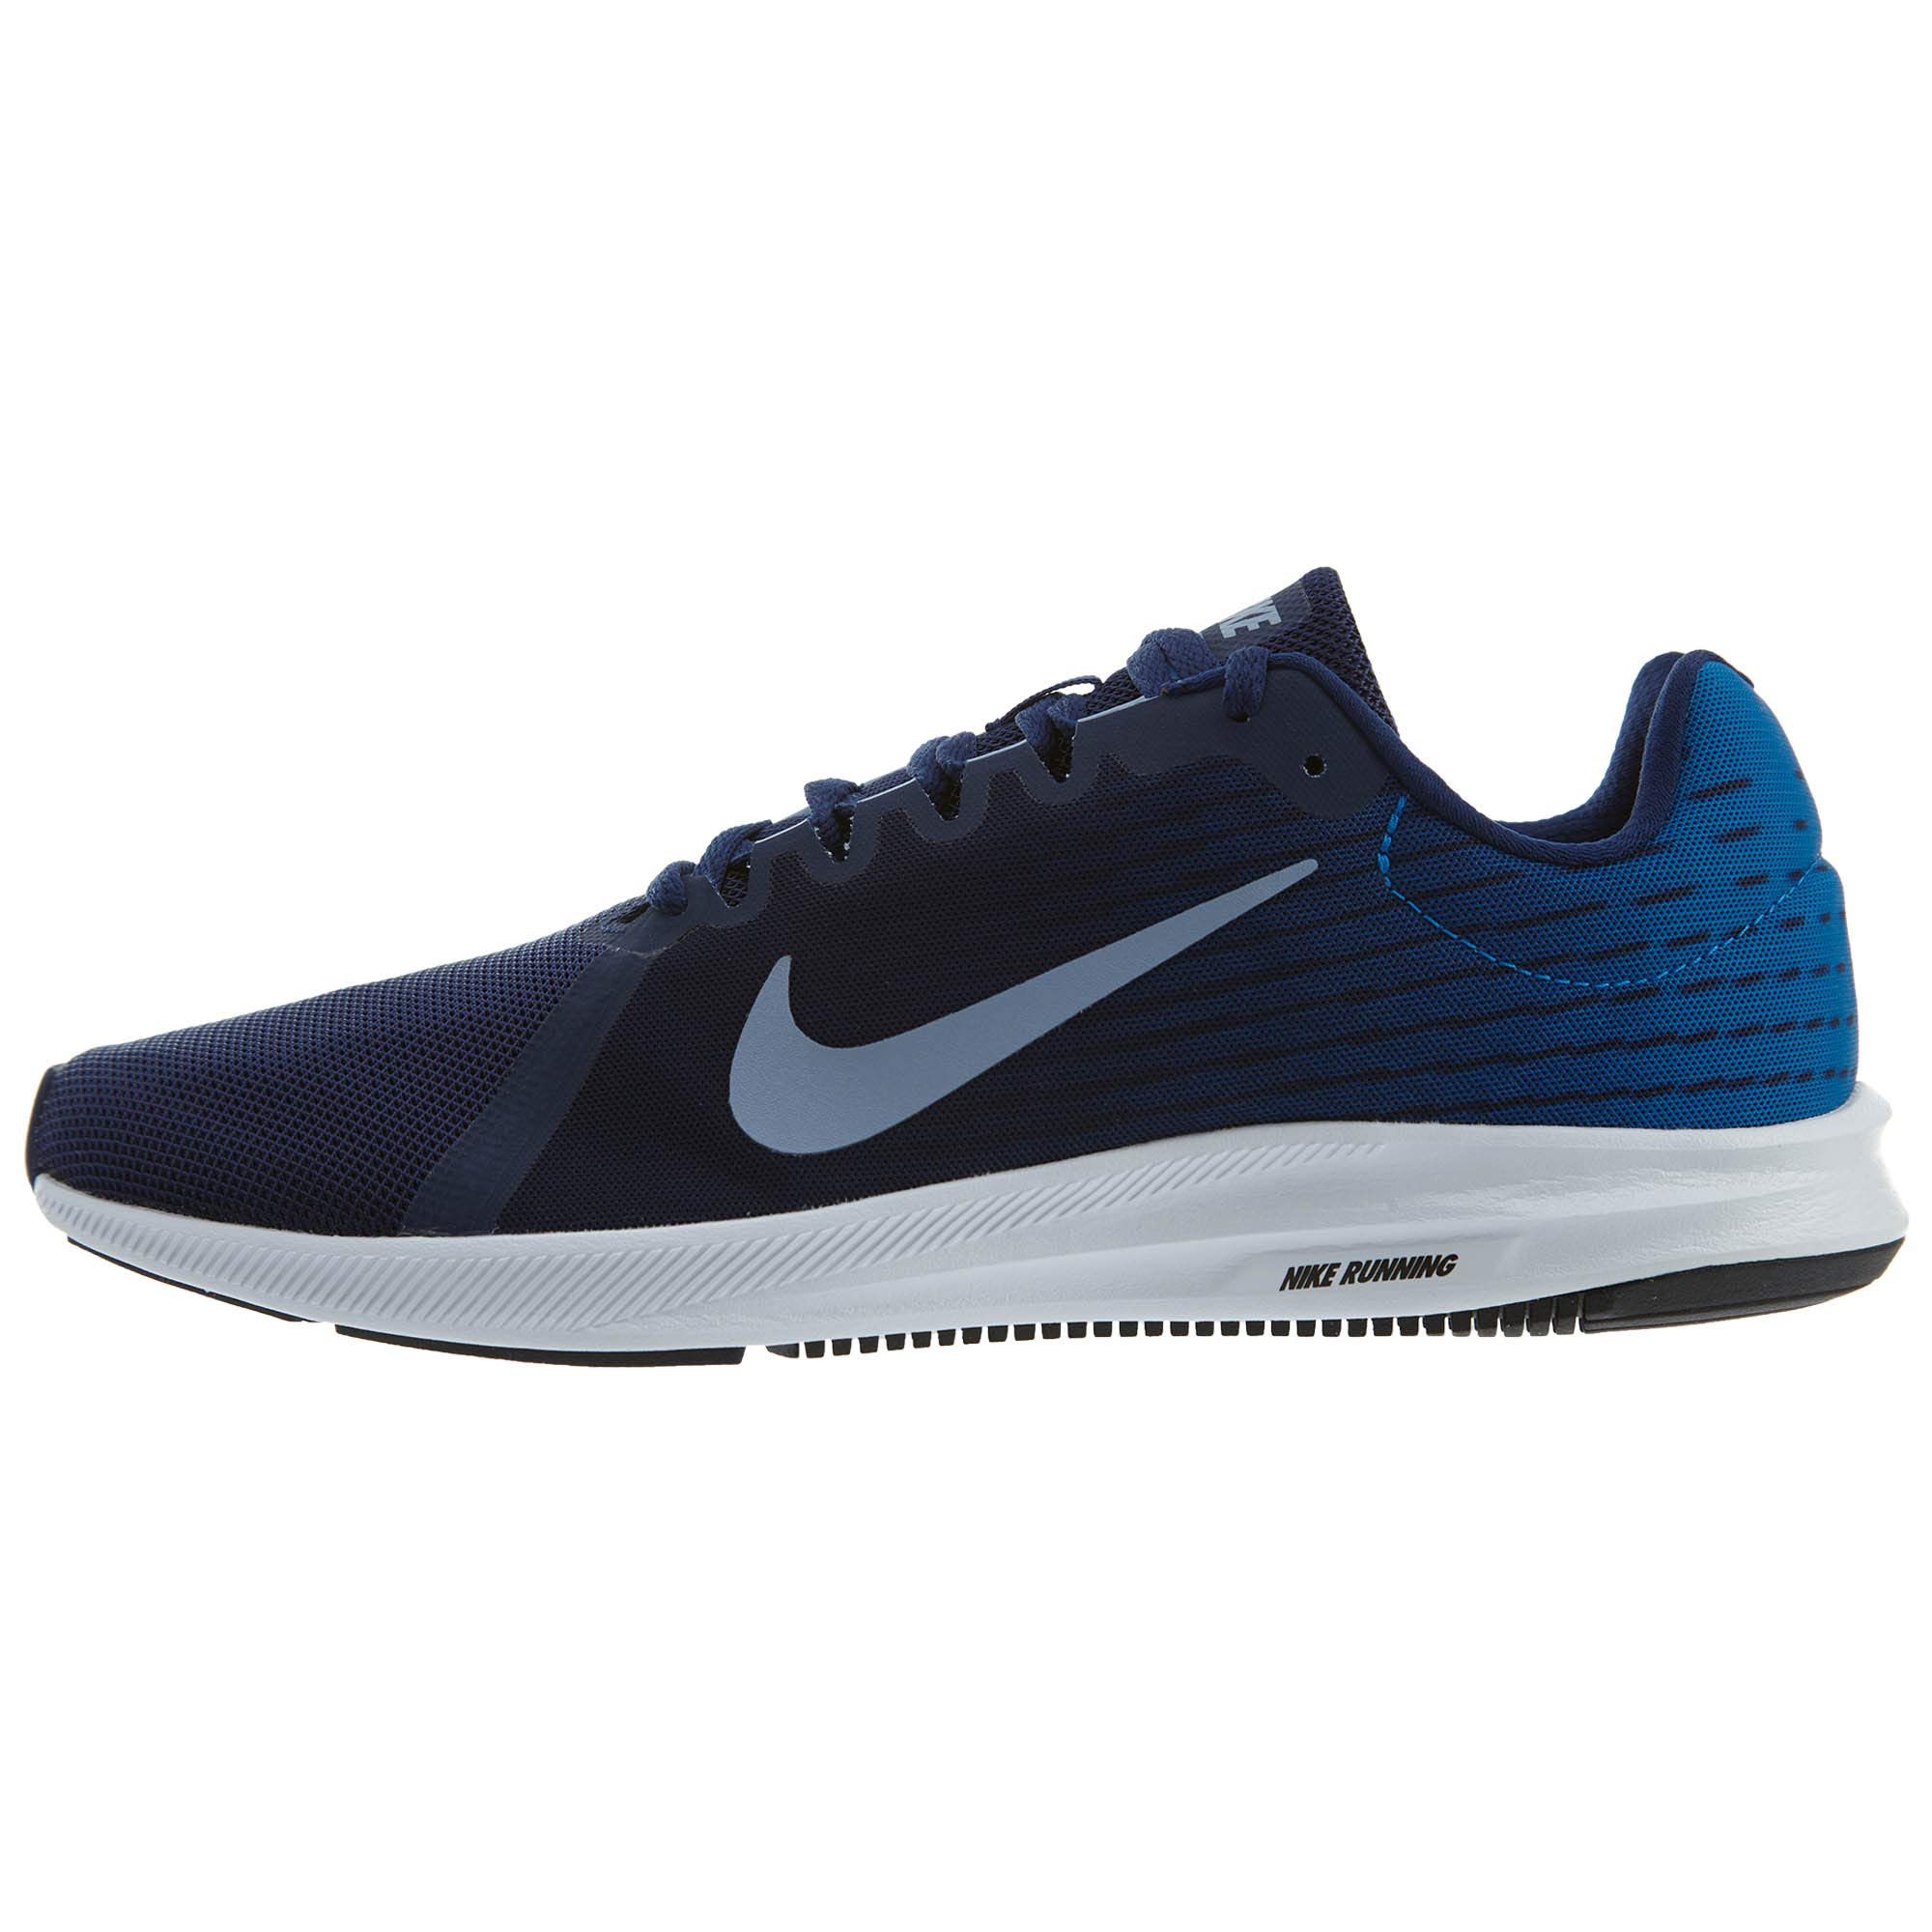 Nike Men's Downshifter 8 Running Shoe Blue Void/Indigo Fog/Photo Blue Size 9.5 M US